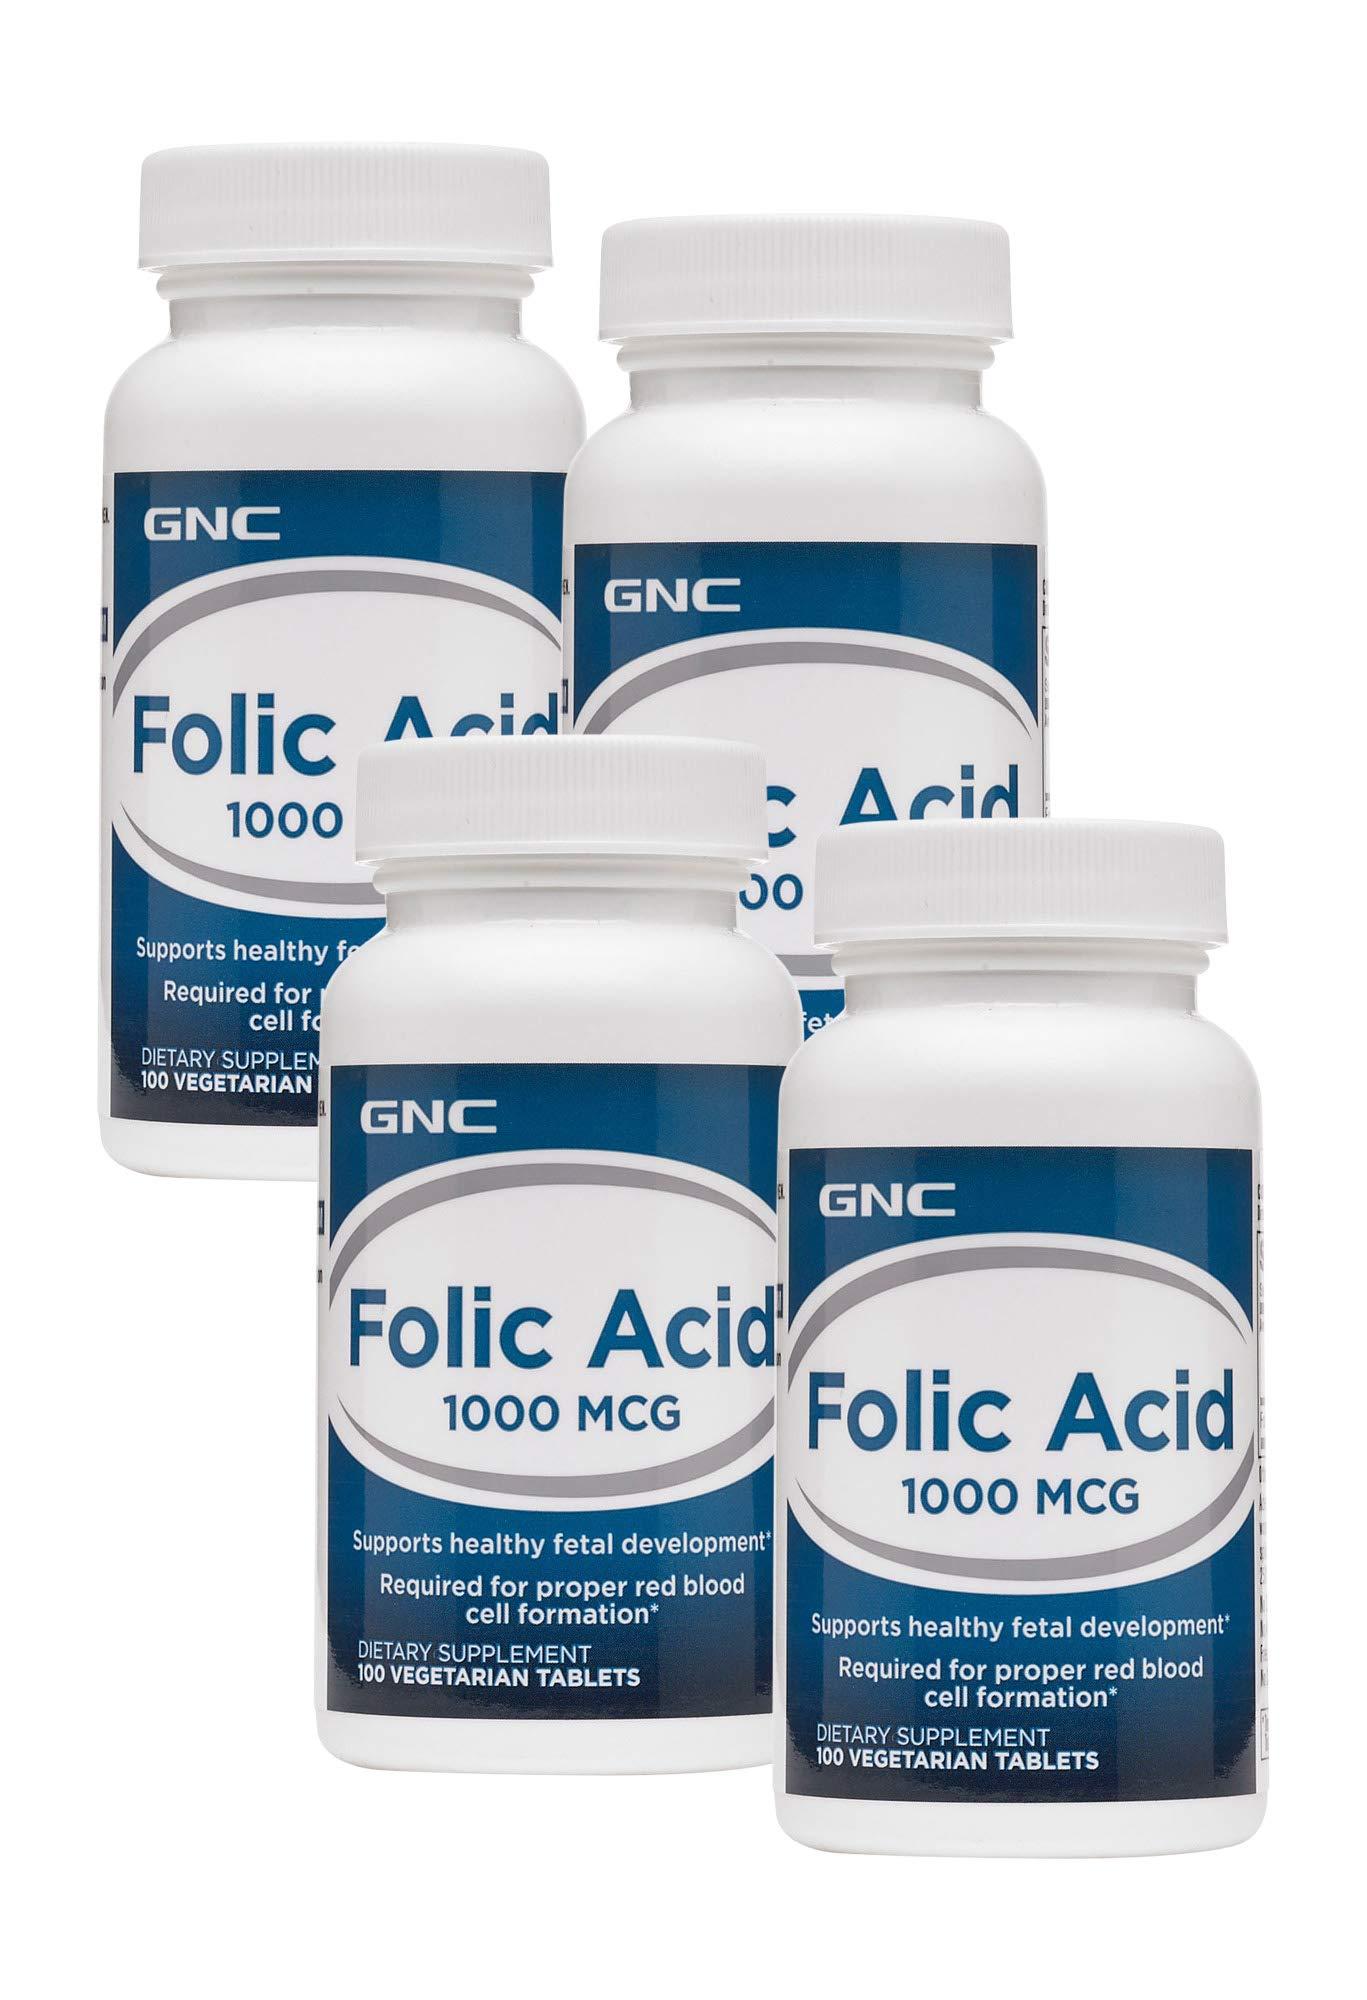 GNC Folic Acid 1000 MCG - 4 Pack by GNC